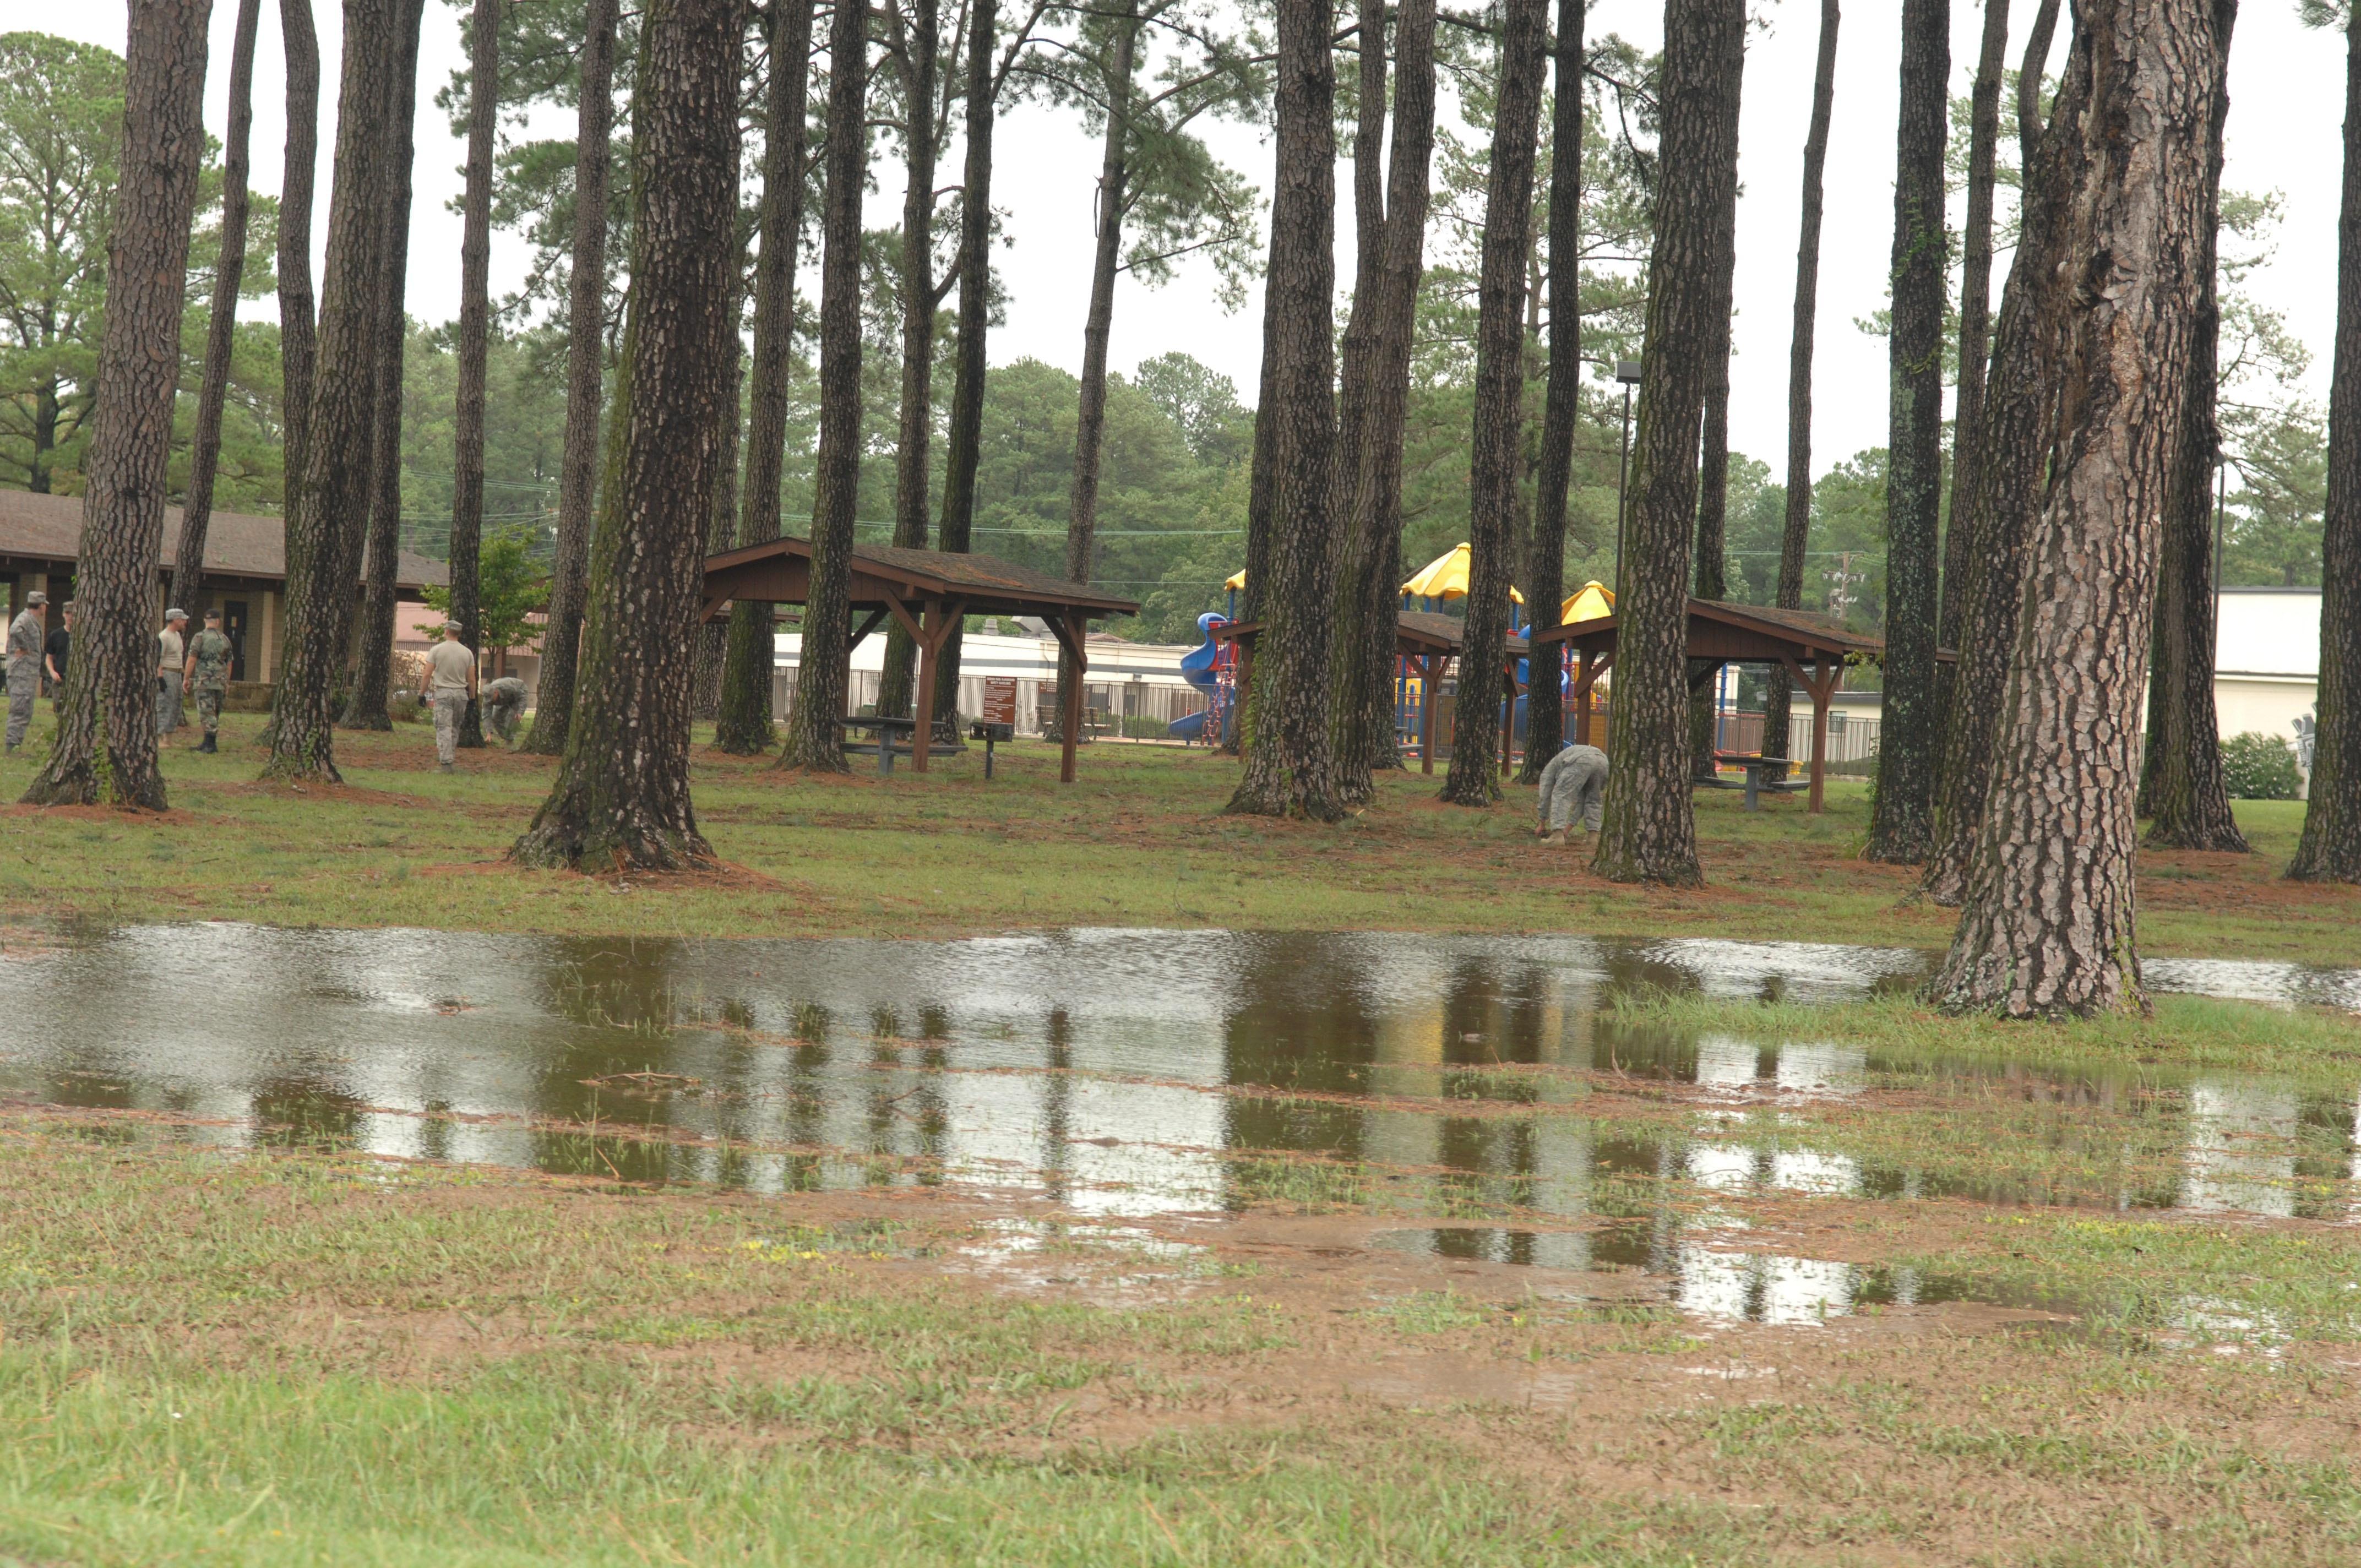 trees drainage issues flooding.jpg